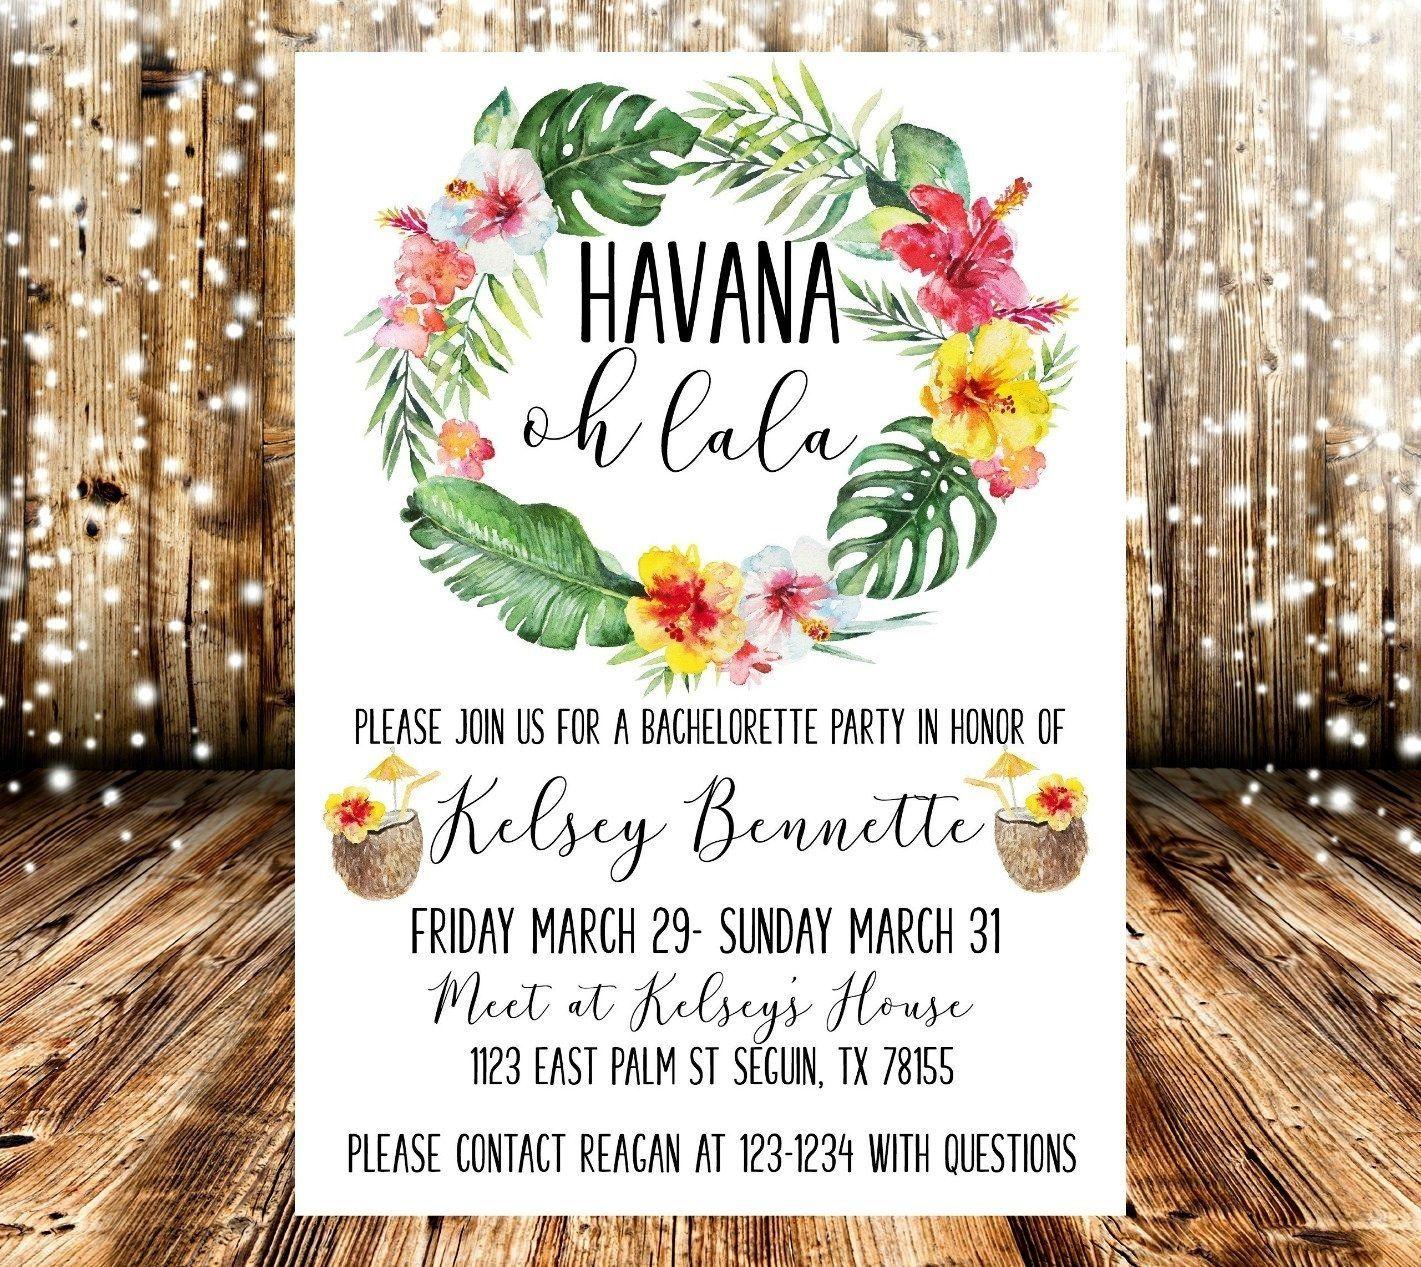 Havana Nights Party Invitation Template di 3